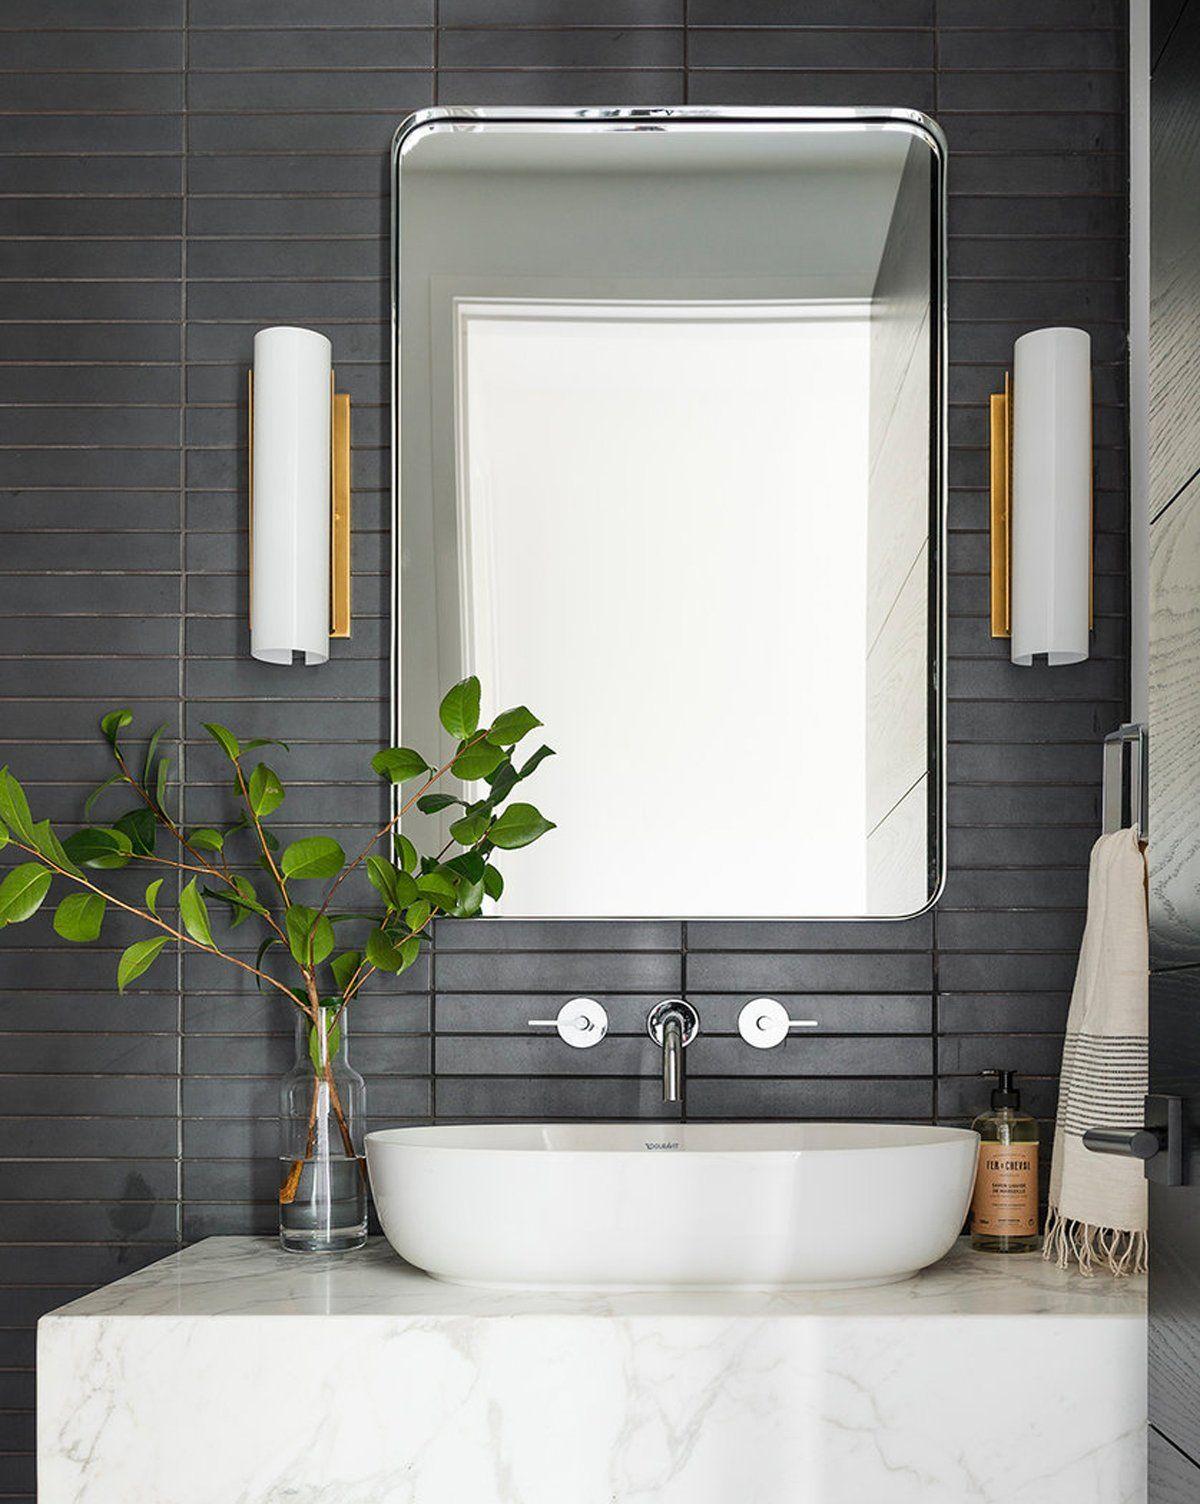 Lighting Stylish Home Decorations Mcgee Co Sconces Exterior Bathroom Bathroom Decor [ 1504 x 1200 Pixel ]